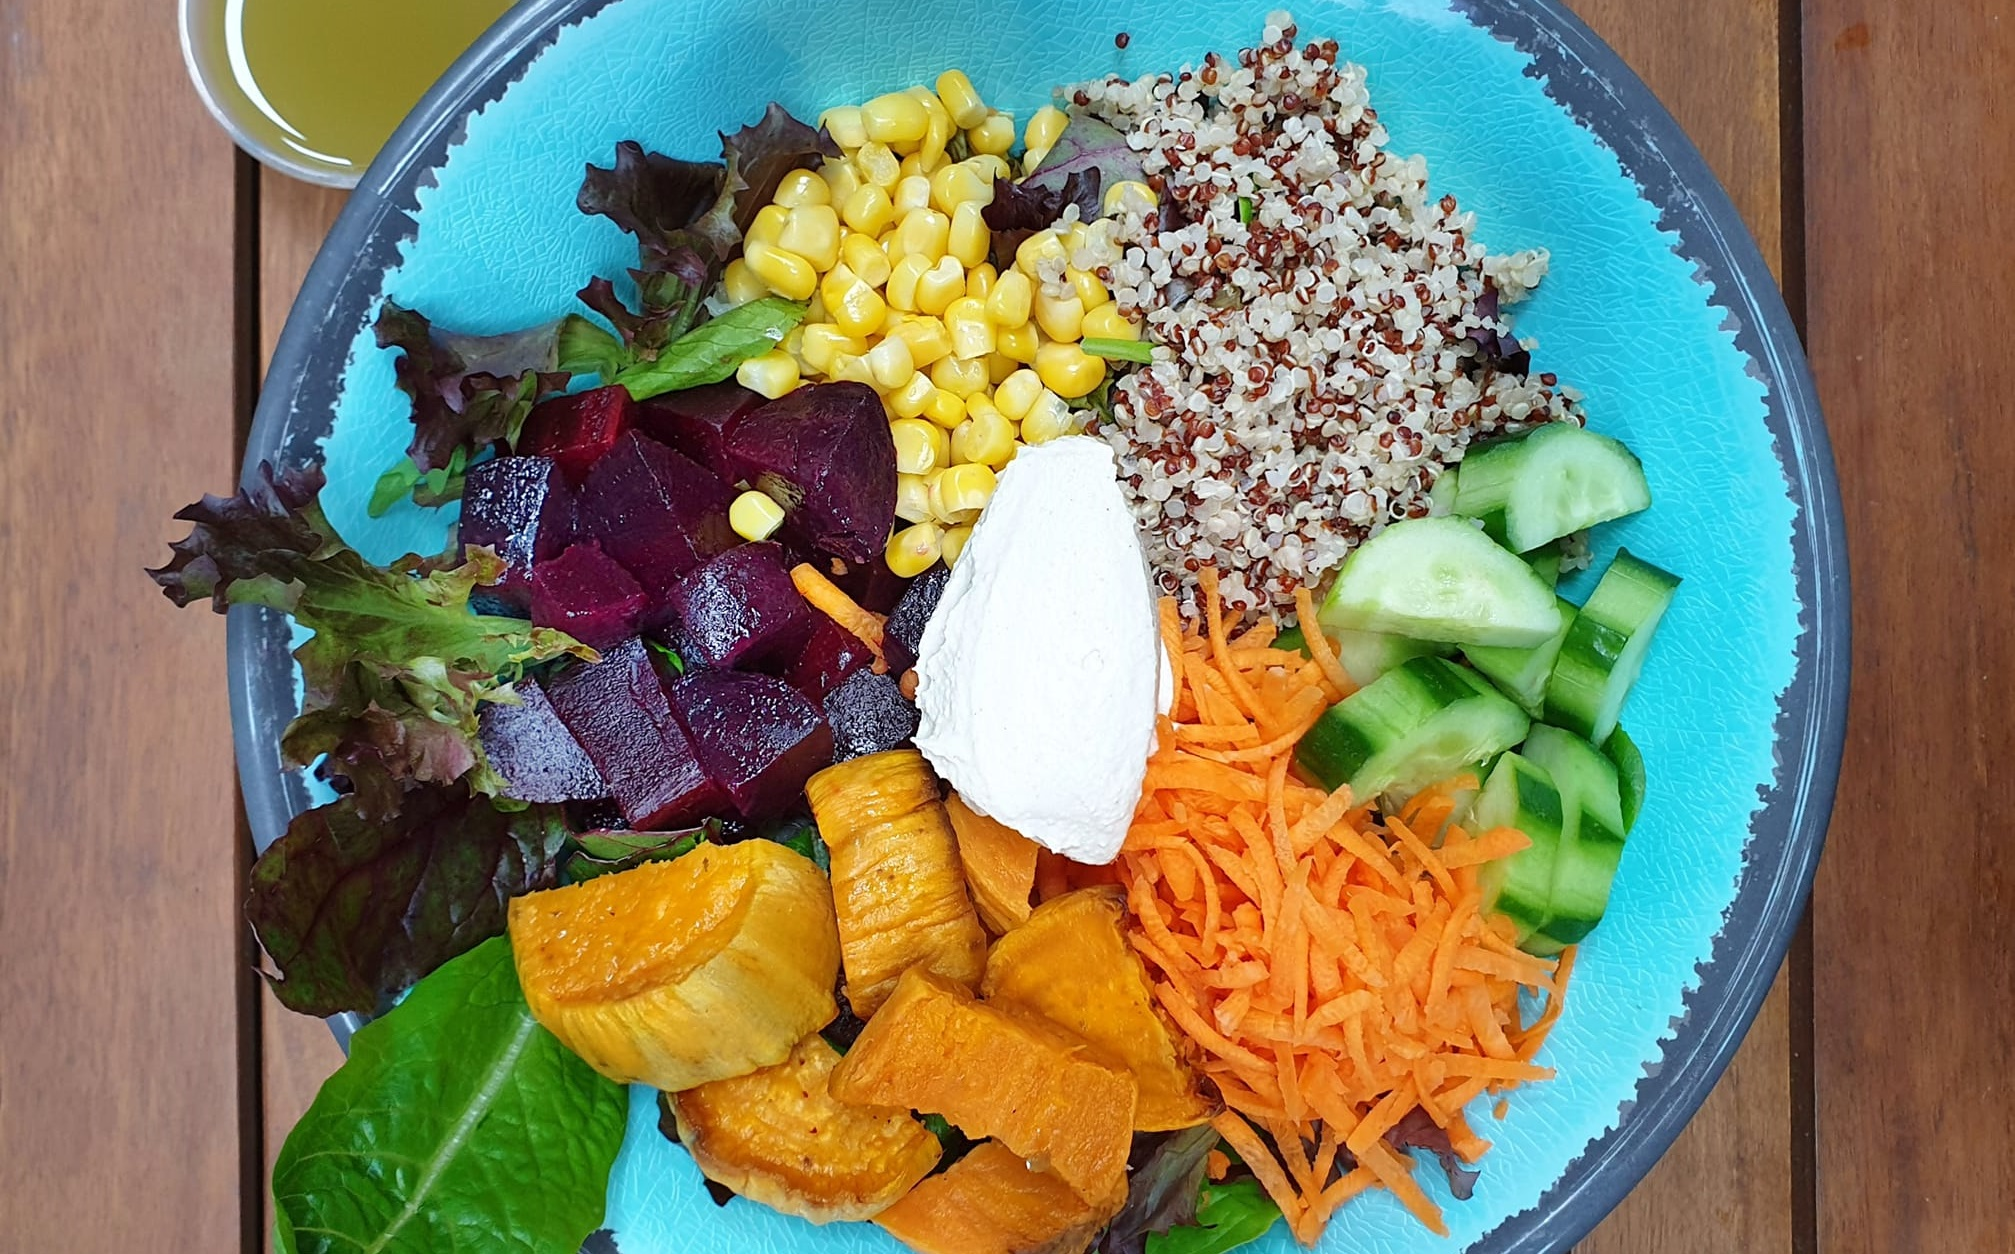 Detox season! 5 στέκια για εσάς που αγαπάτε τις σαλάτες